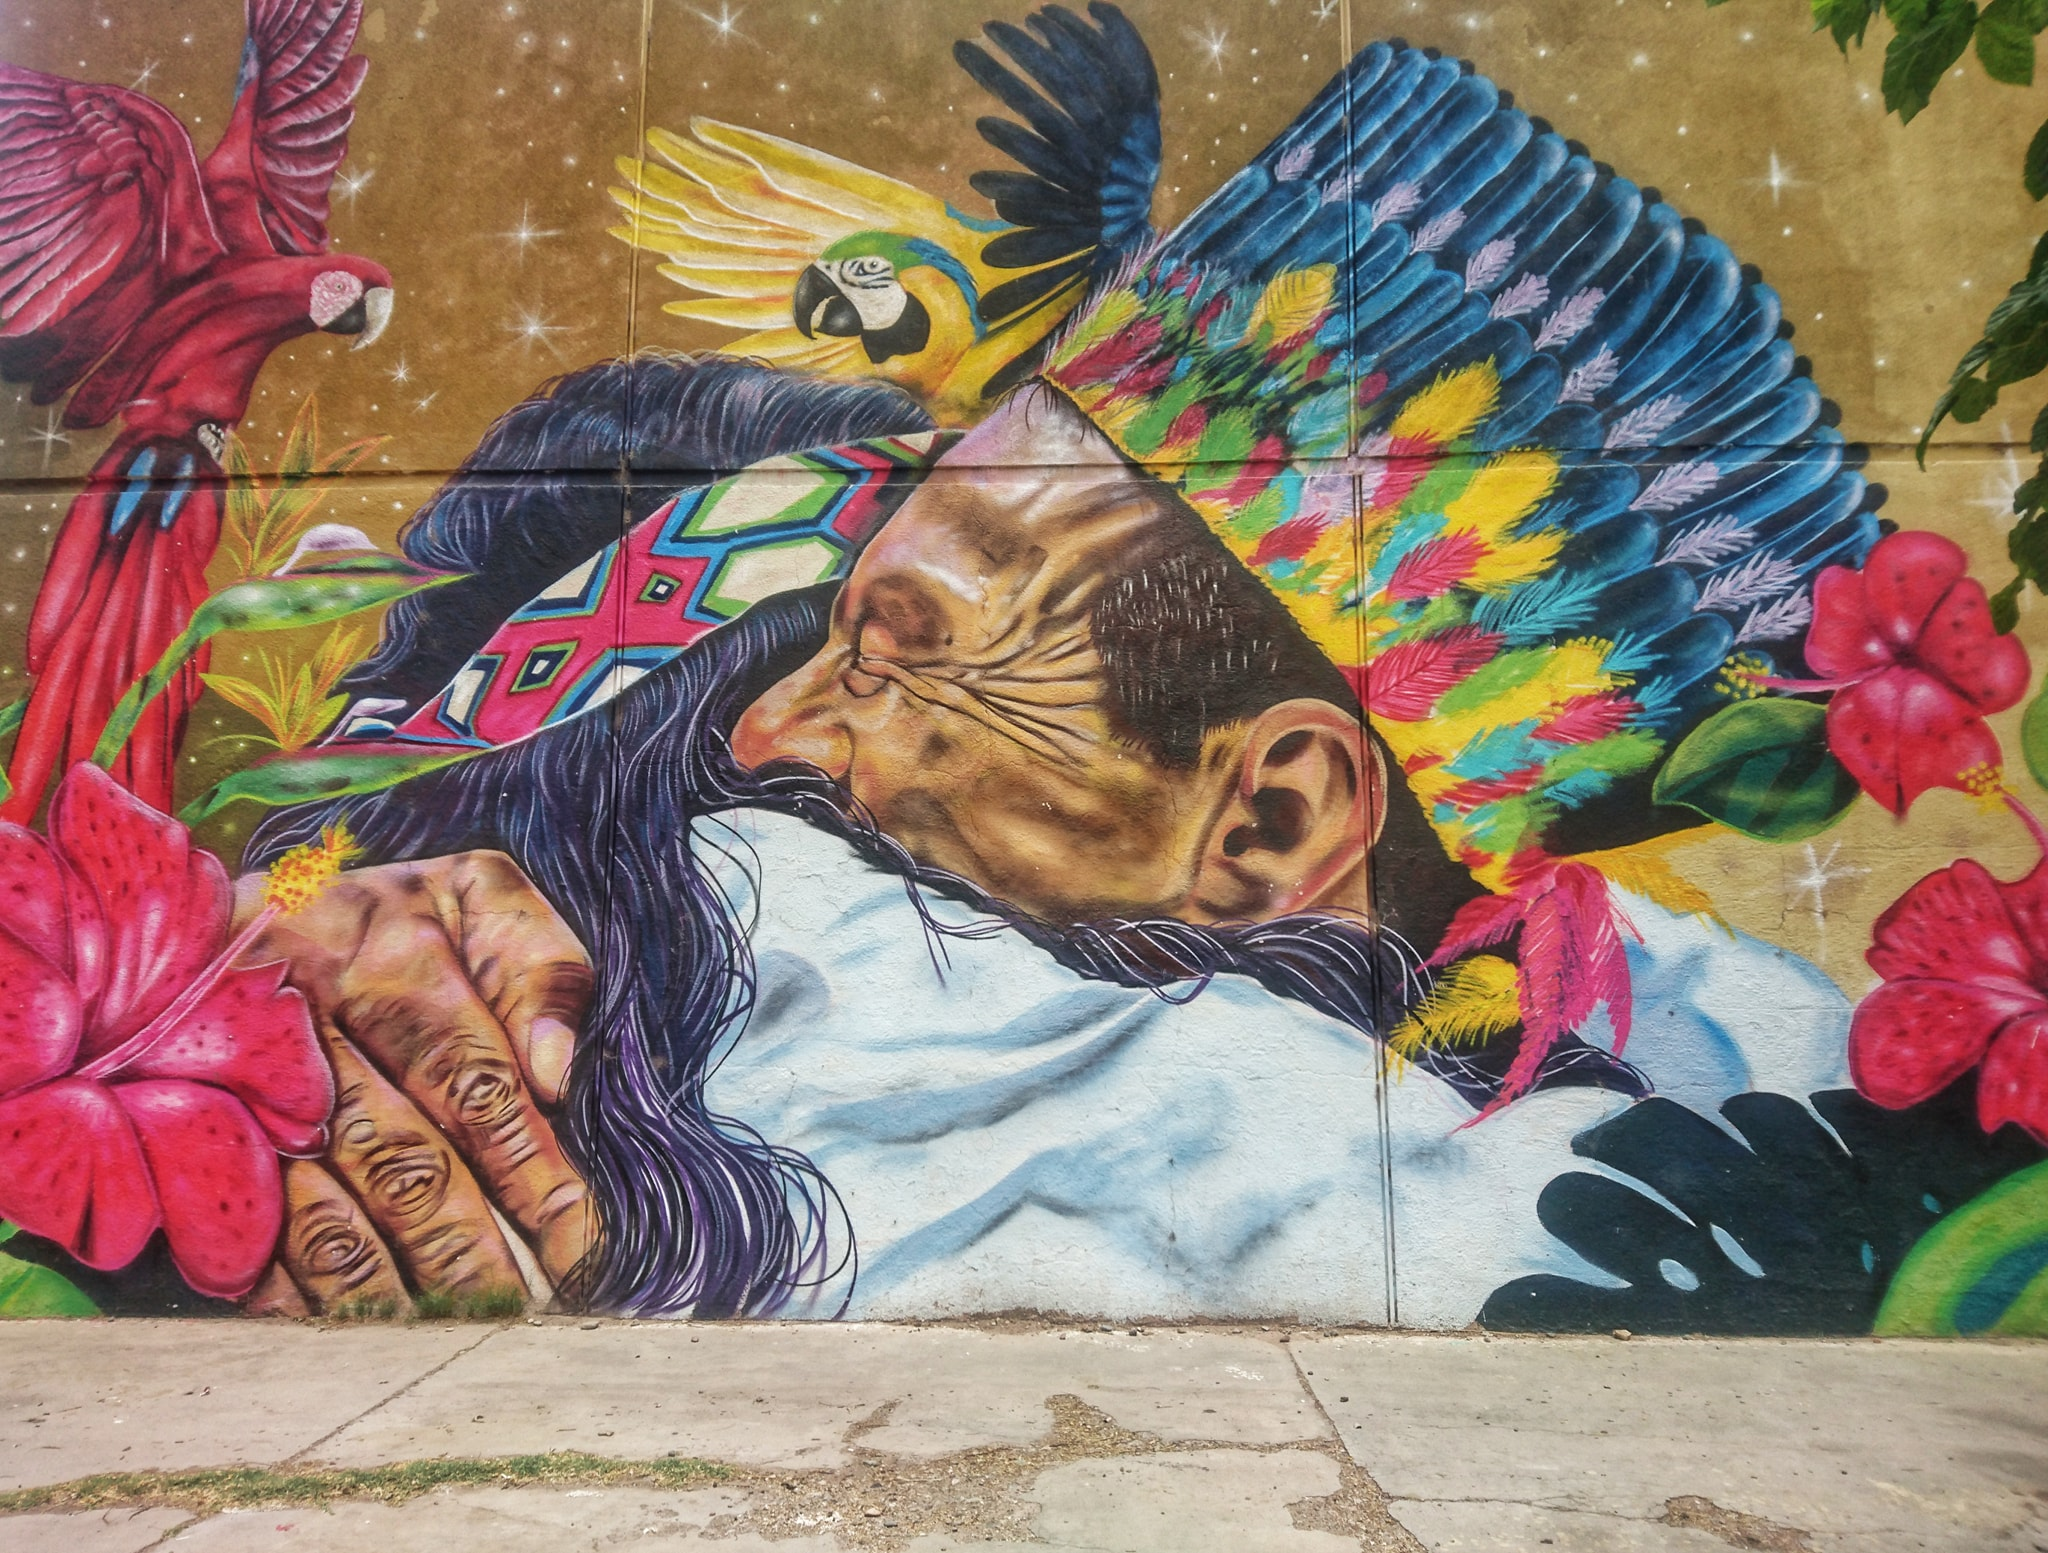 Mural Street Art, San Juan Capital, Argentine